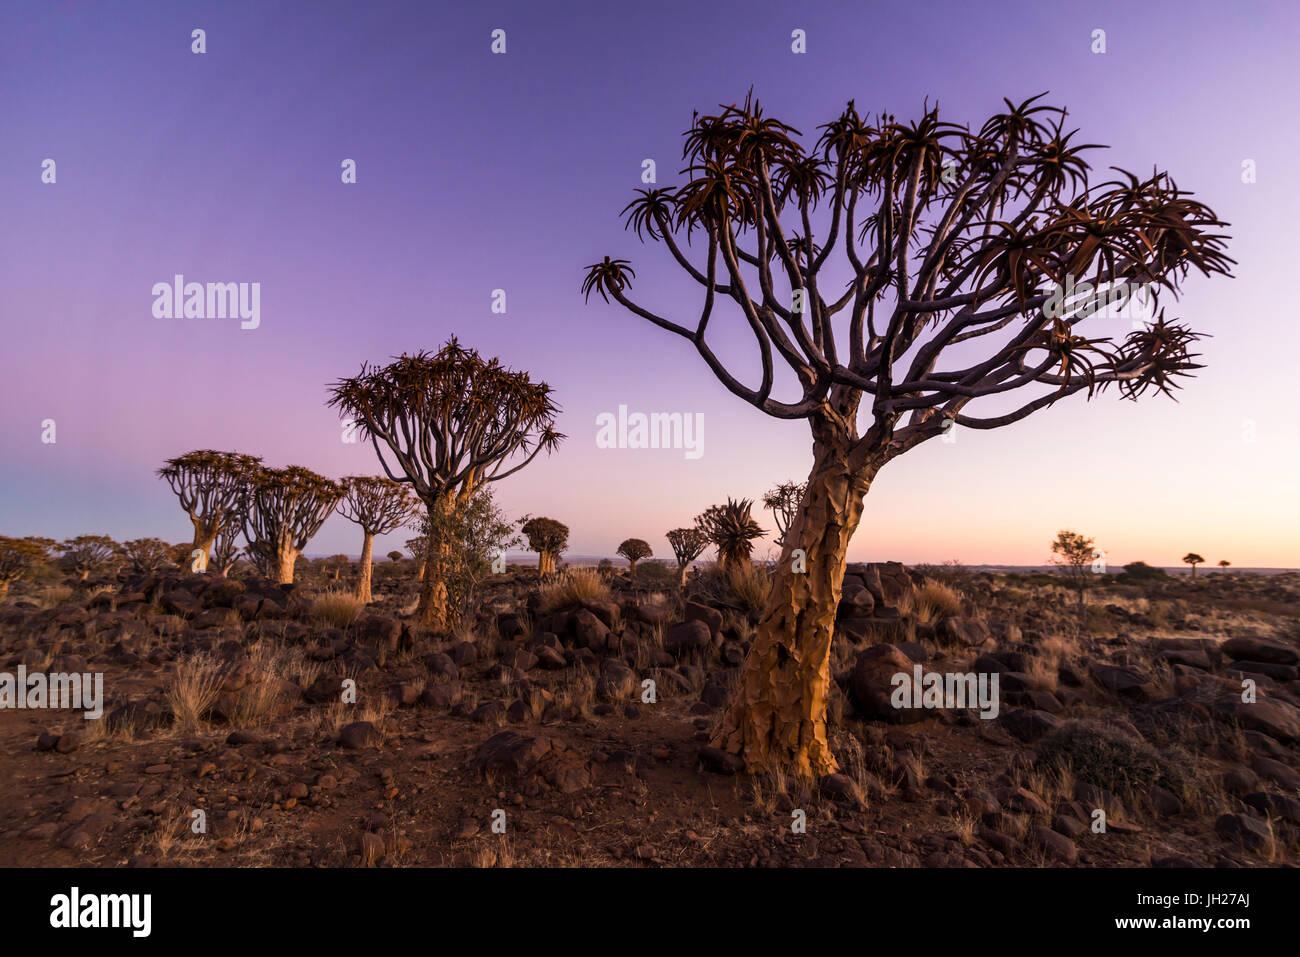 El carcaj tree forest (Aloe dichotoma) al atardecer, Gariganus granja, Keetmanshoop, Namibia, África Imagen De Stock